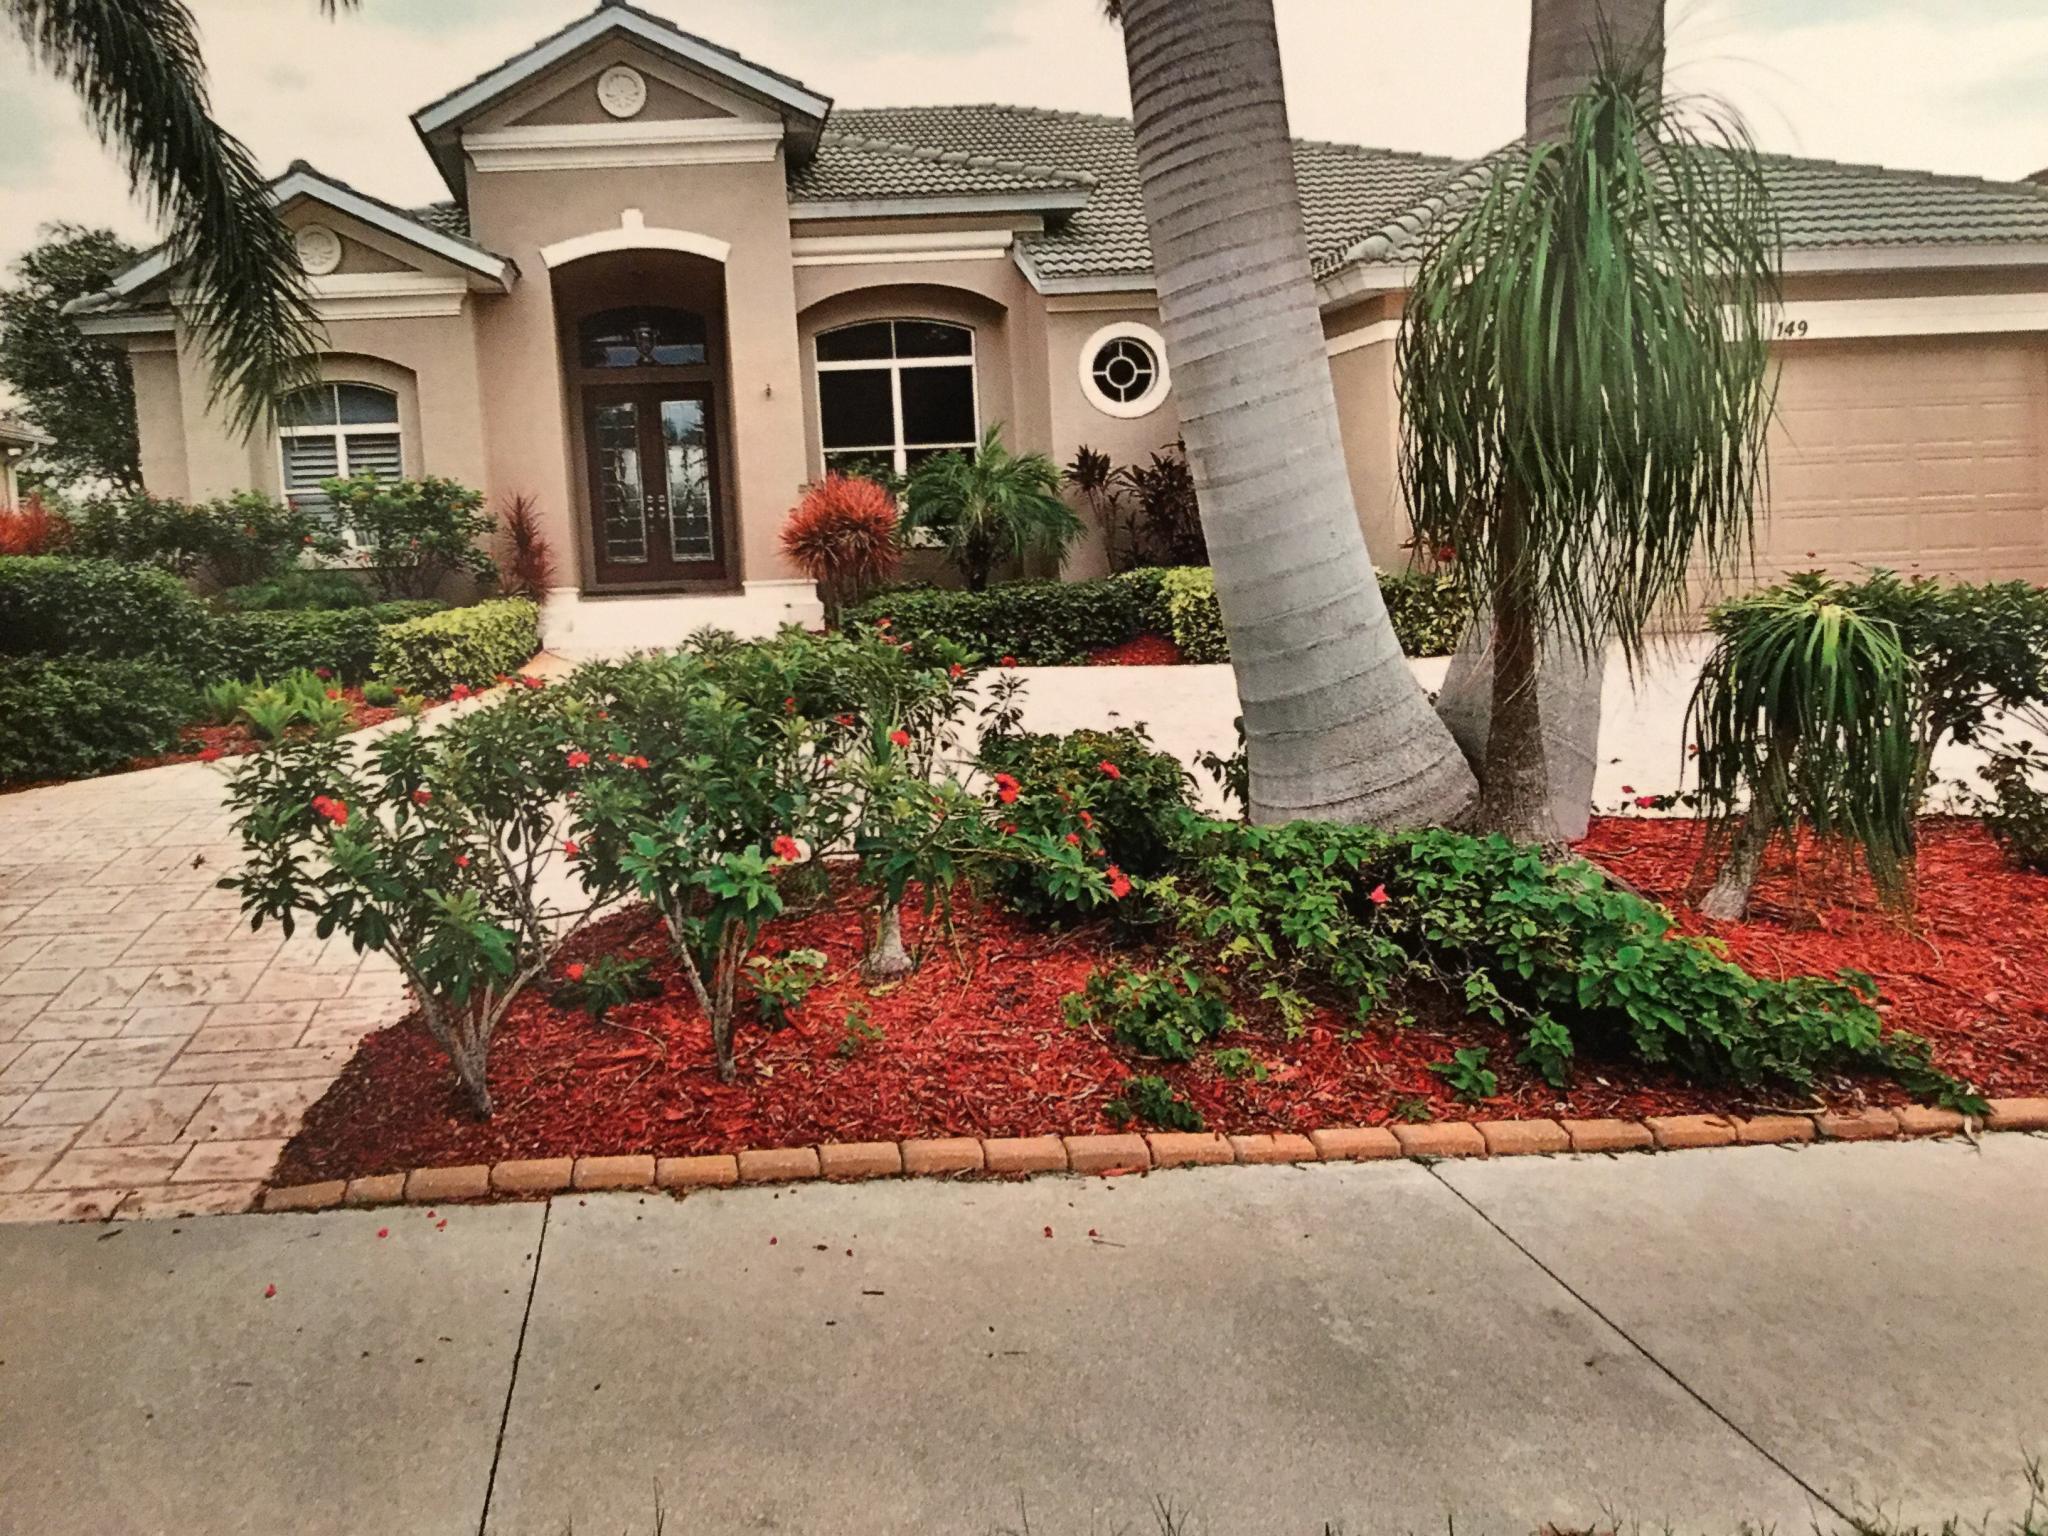 149 Bald Eagle Dr, Marco Island, FL 34145 For Rent | Trulia